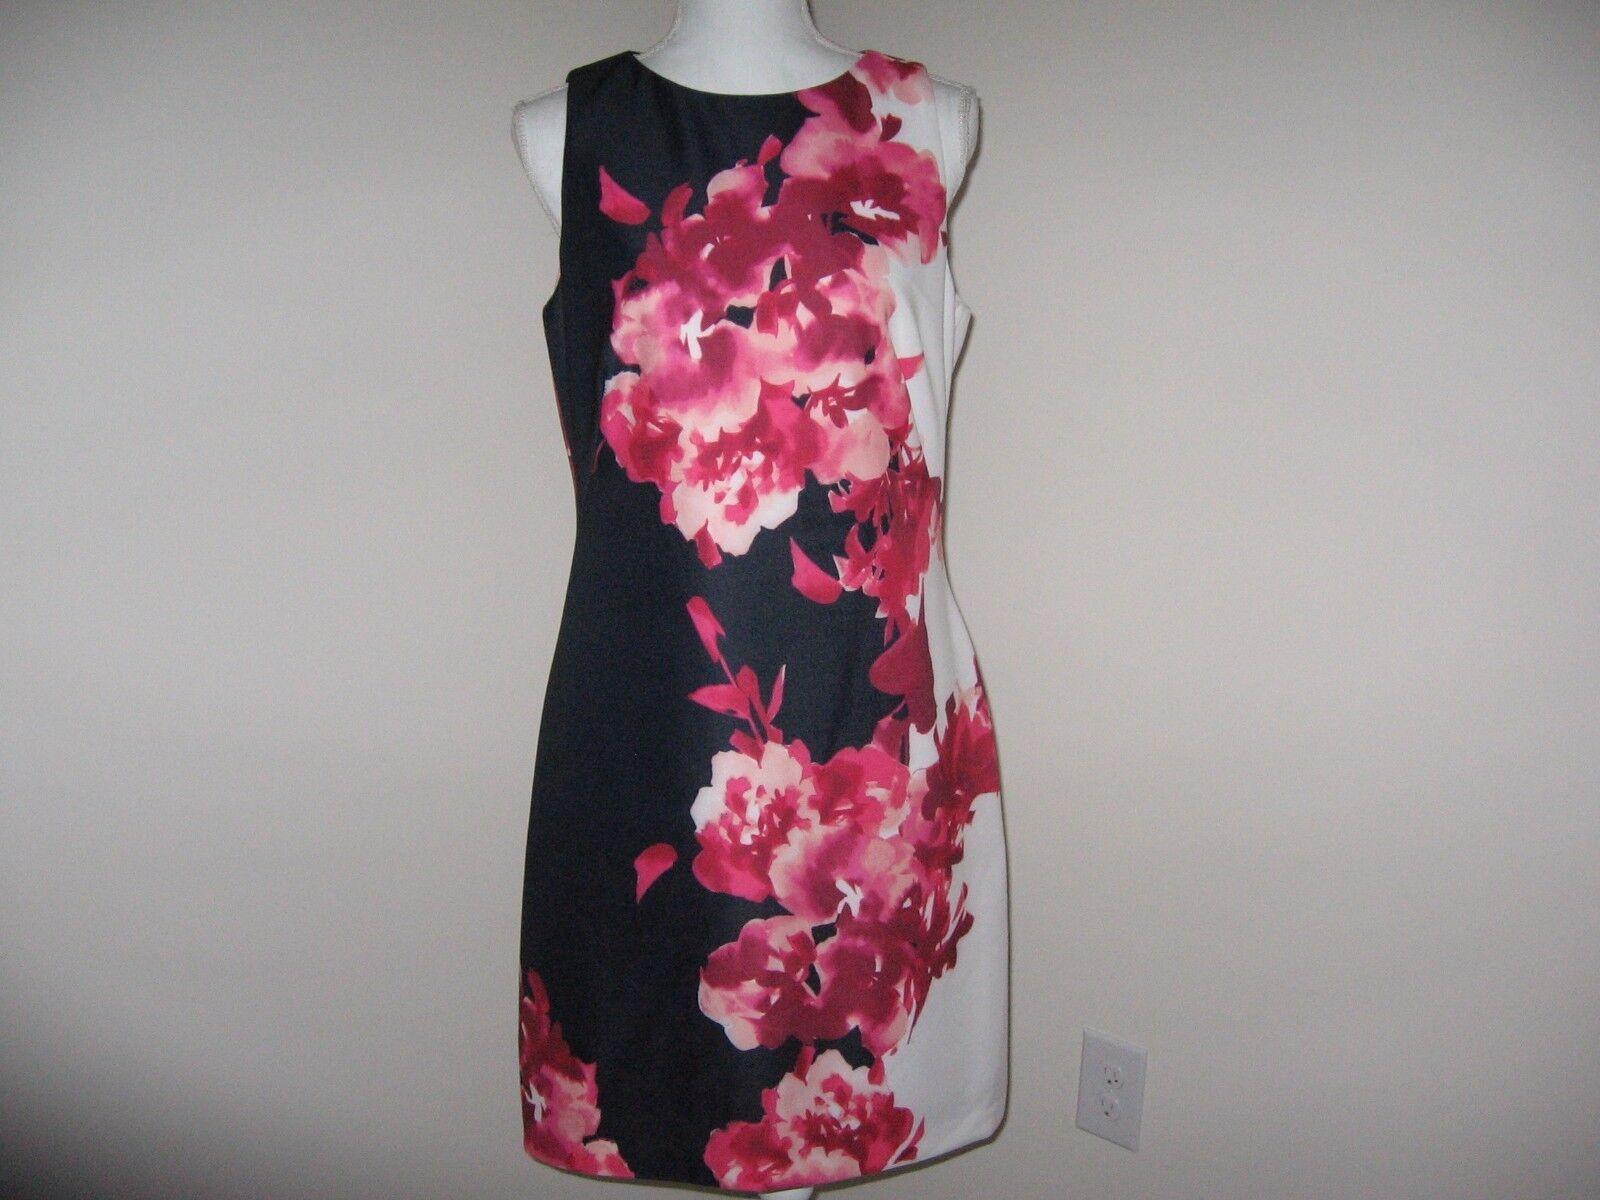 Lauren Ralph Lauren Floral Ponte Dress for Woman SIZE 12  NWT MSRP